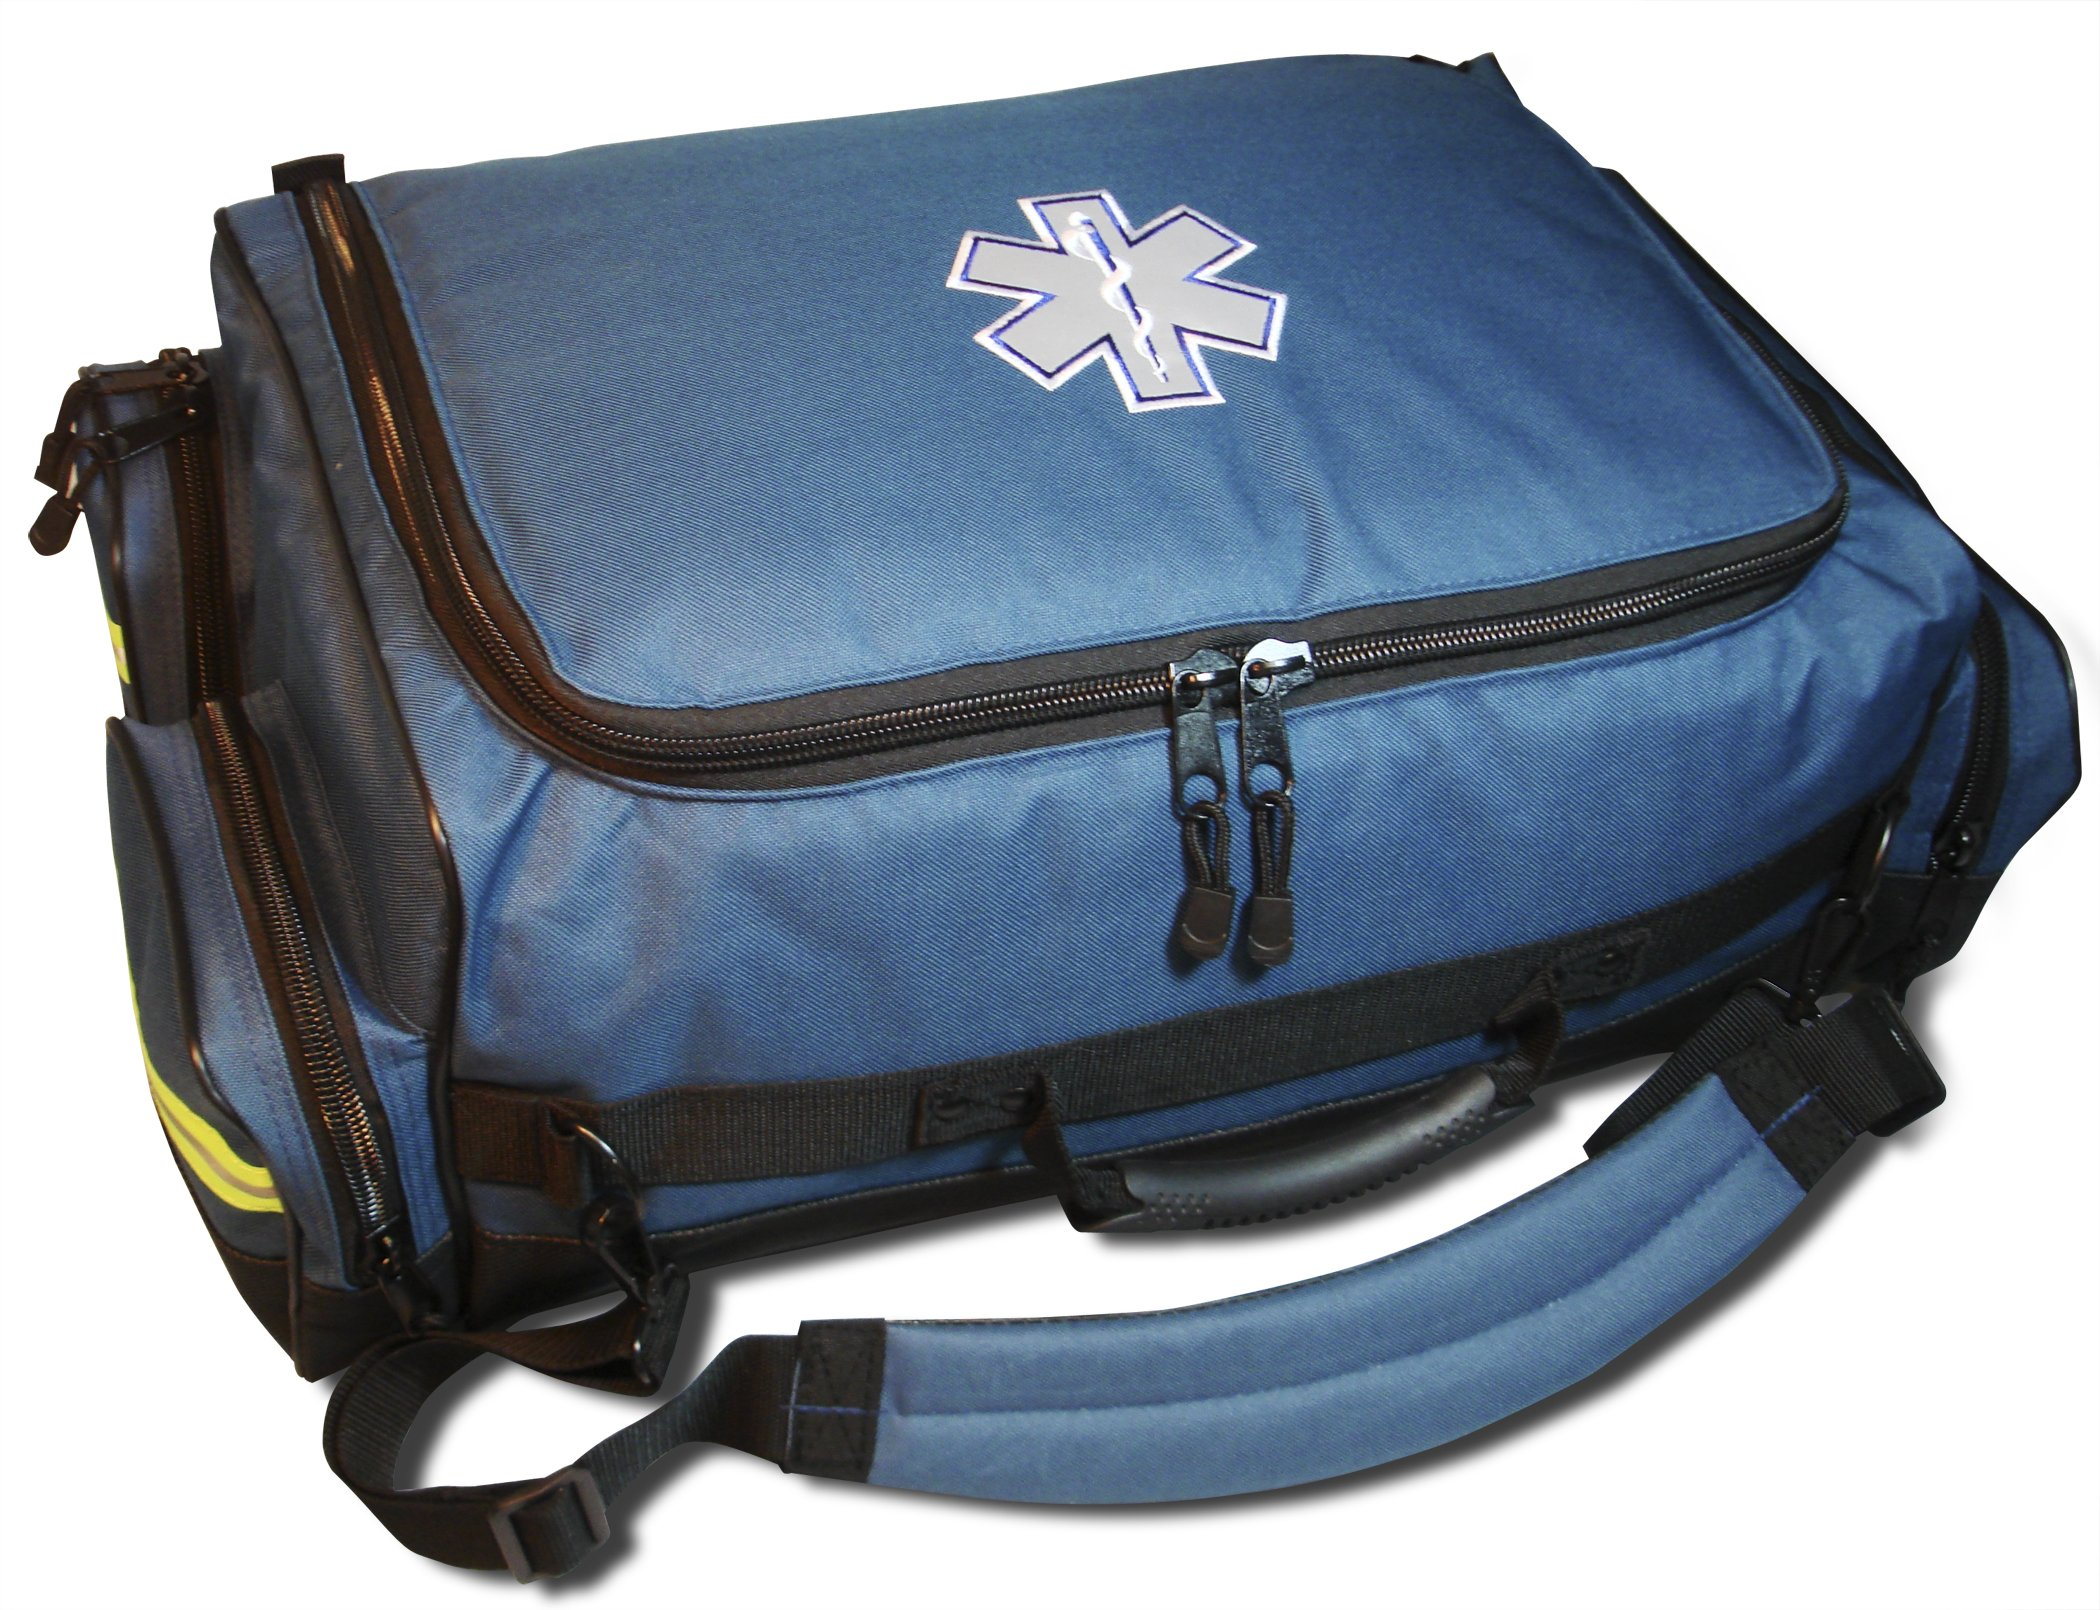 SALE! Lightning X Modular X-Tuff Oxygen Trauma Bag w/Zip-Out Cylinder Pocket & Removable Pouches - Navy Blue